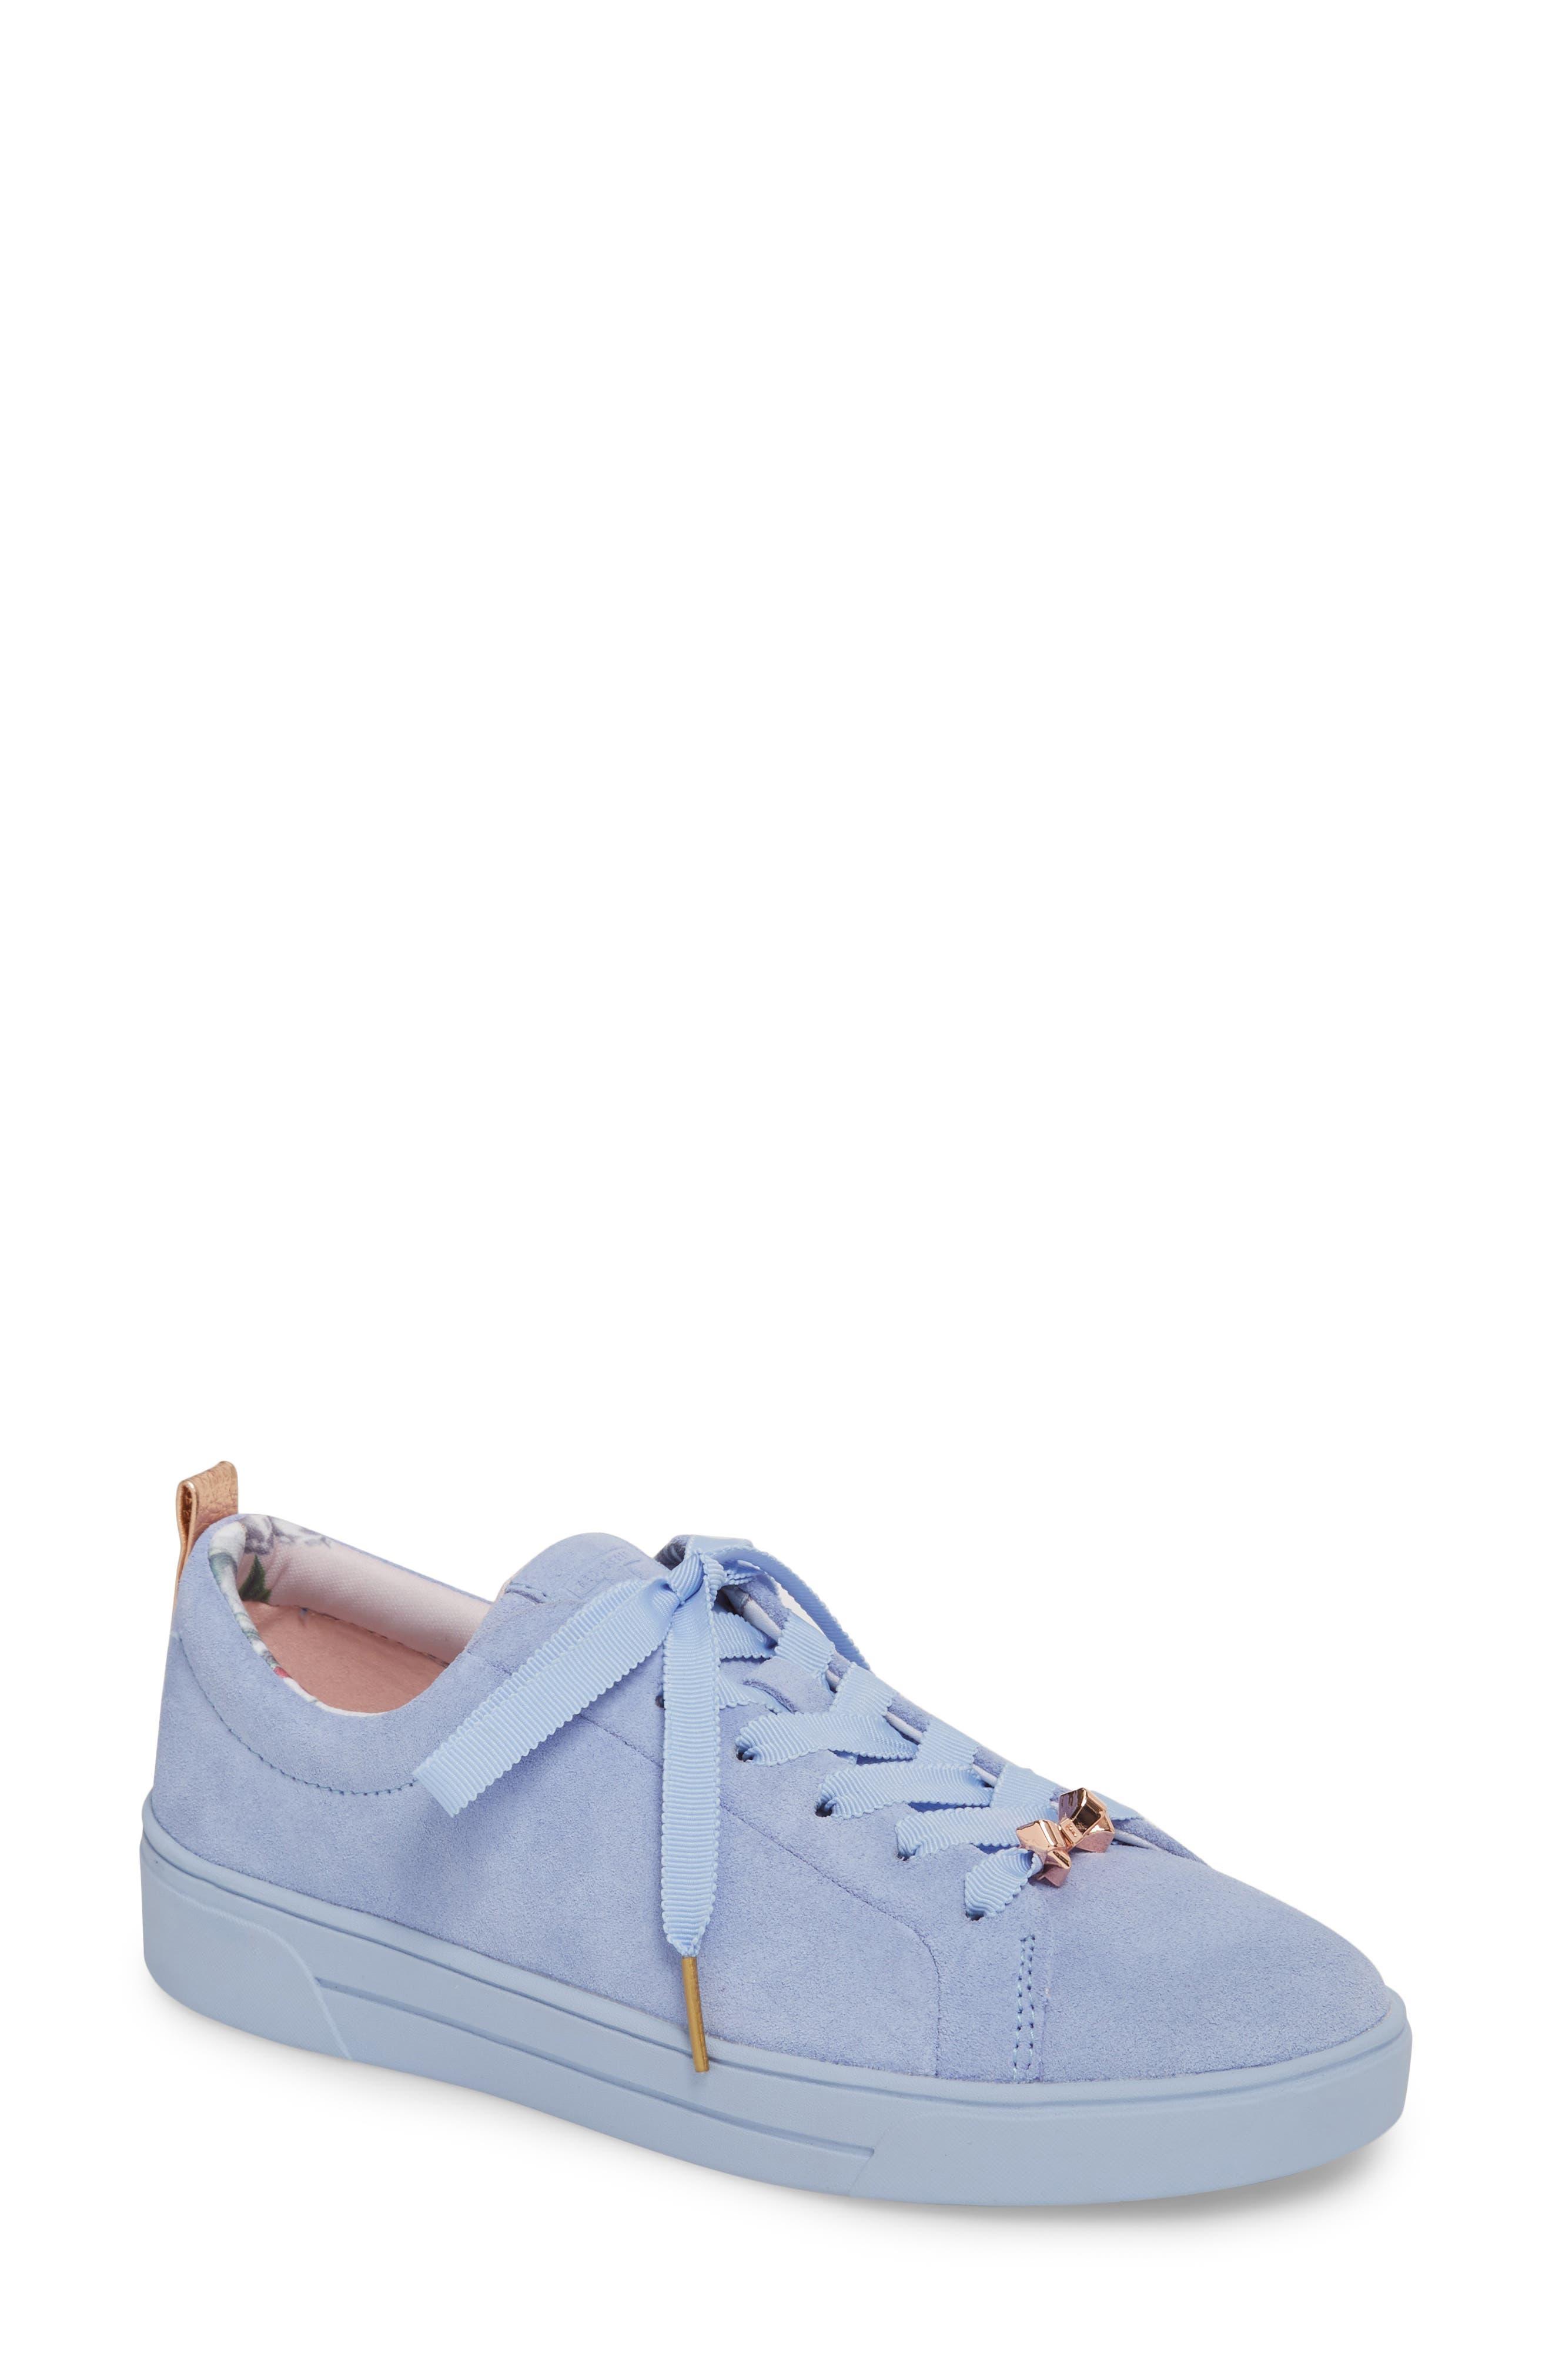 Kelleis Sneaker,                             Main thumbnail 1, color,                             Light Blue Suede